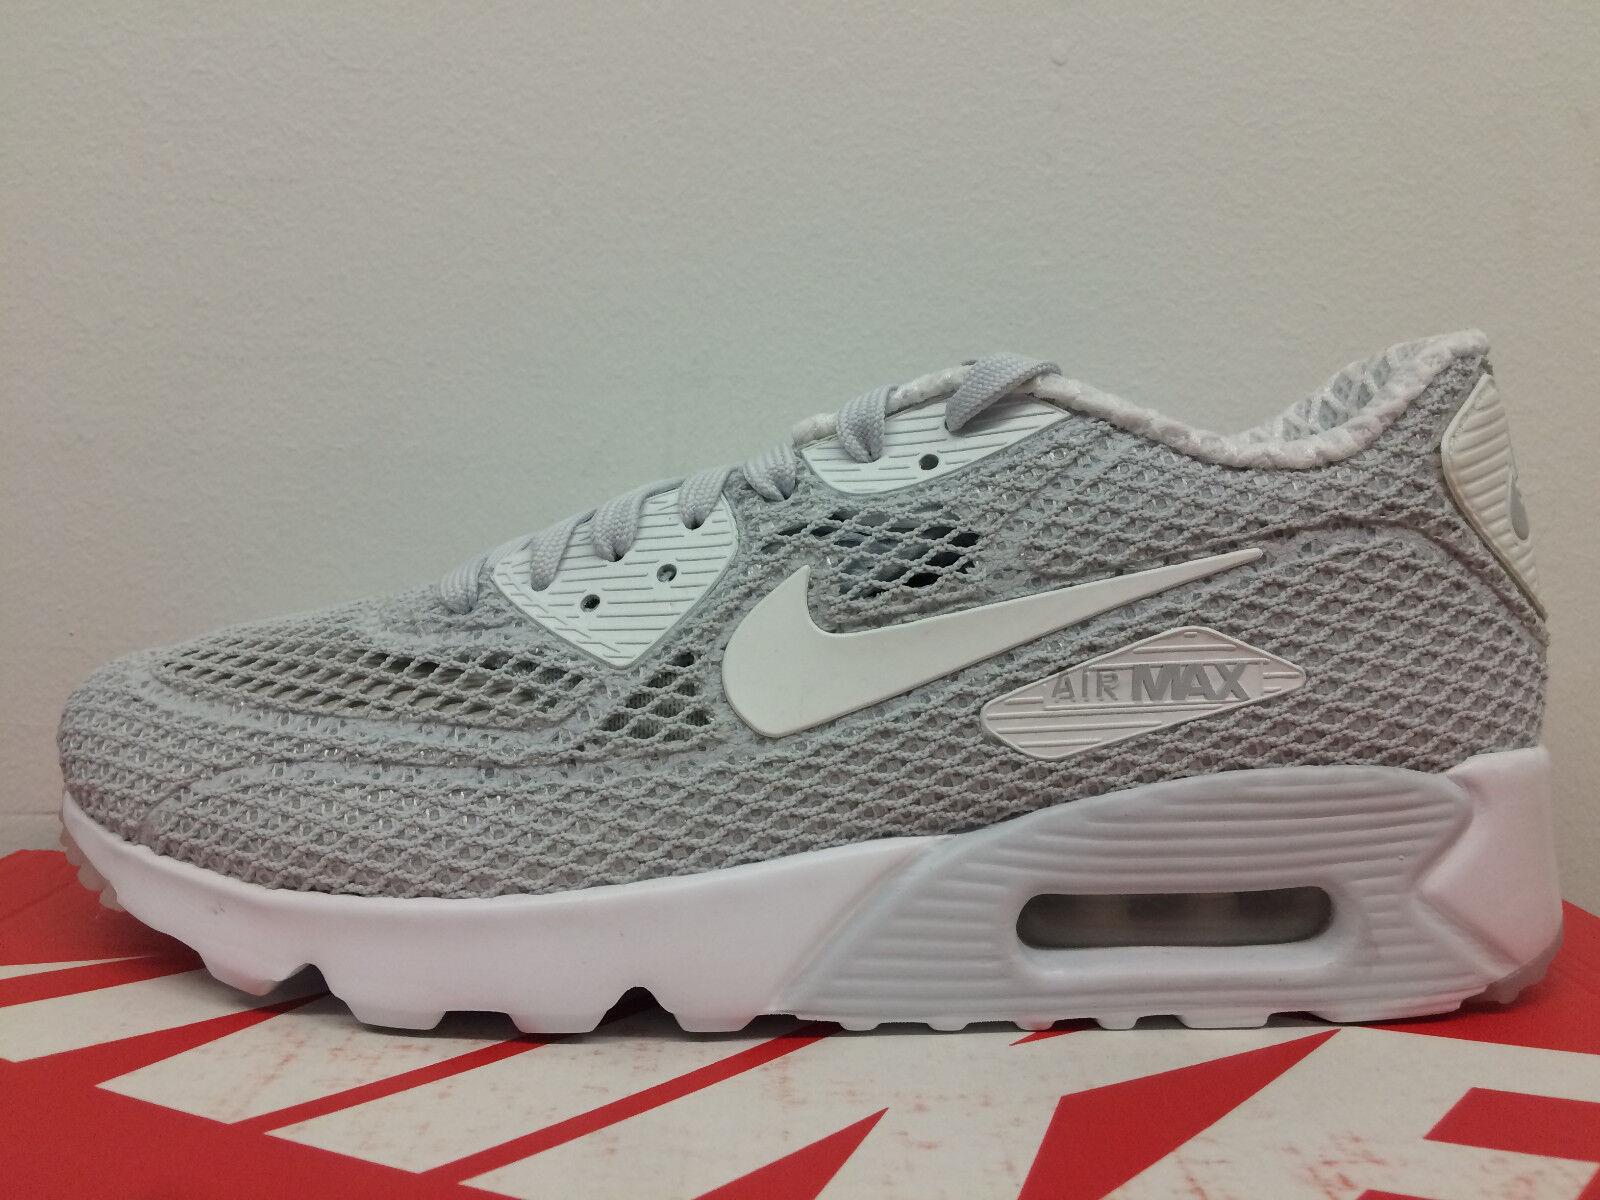 Nike Air Max 90 Ultra BR Premium QS Platinum 810170-001 8-12